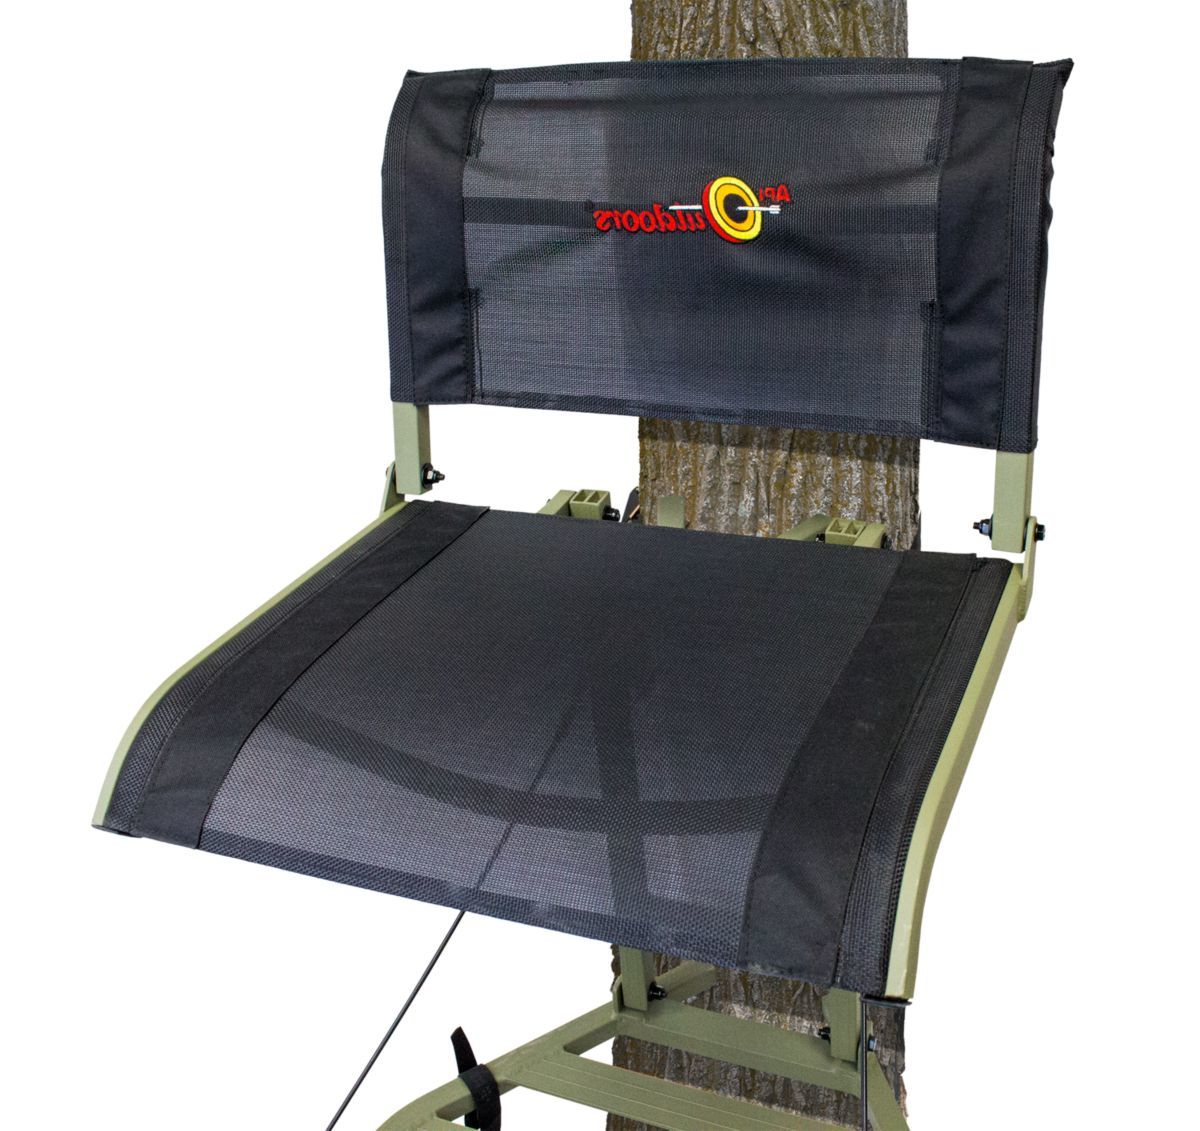 API Outdoors® Superlite Elite Hang-on Treestand